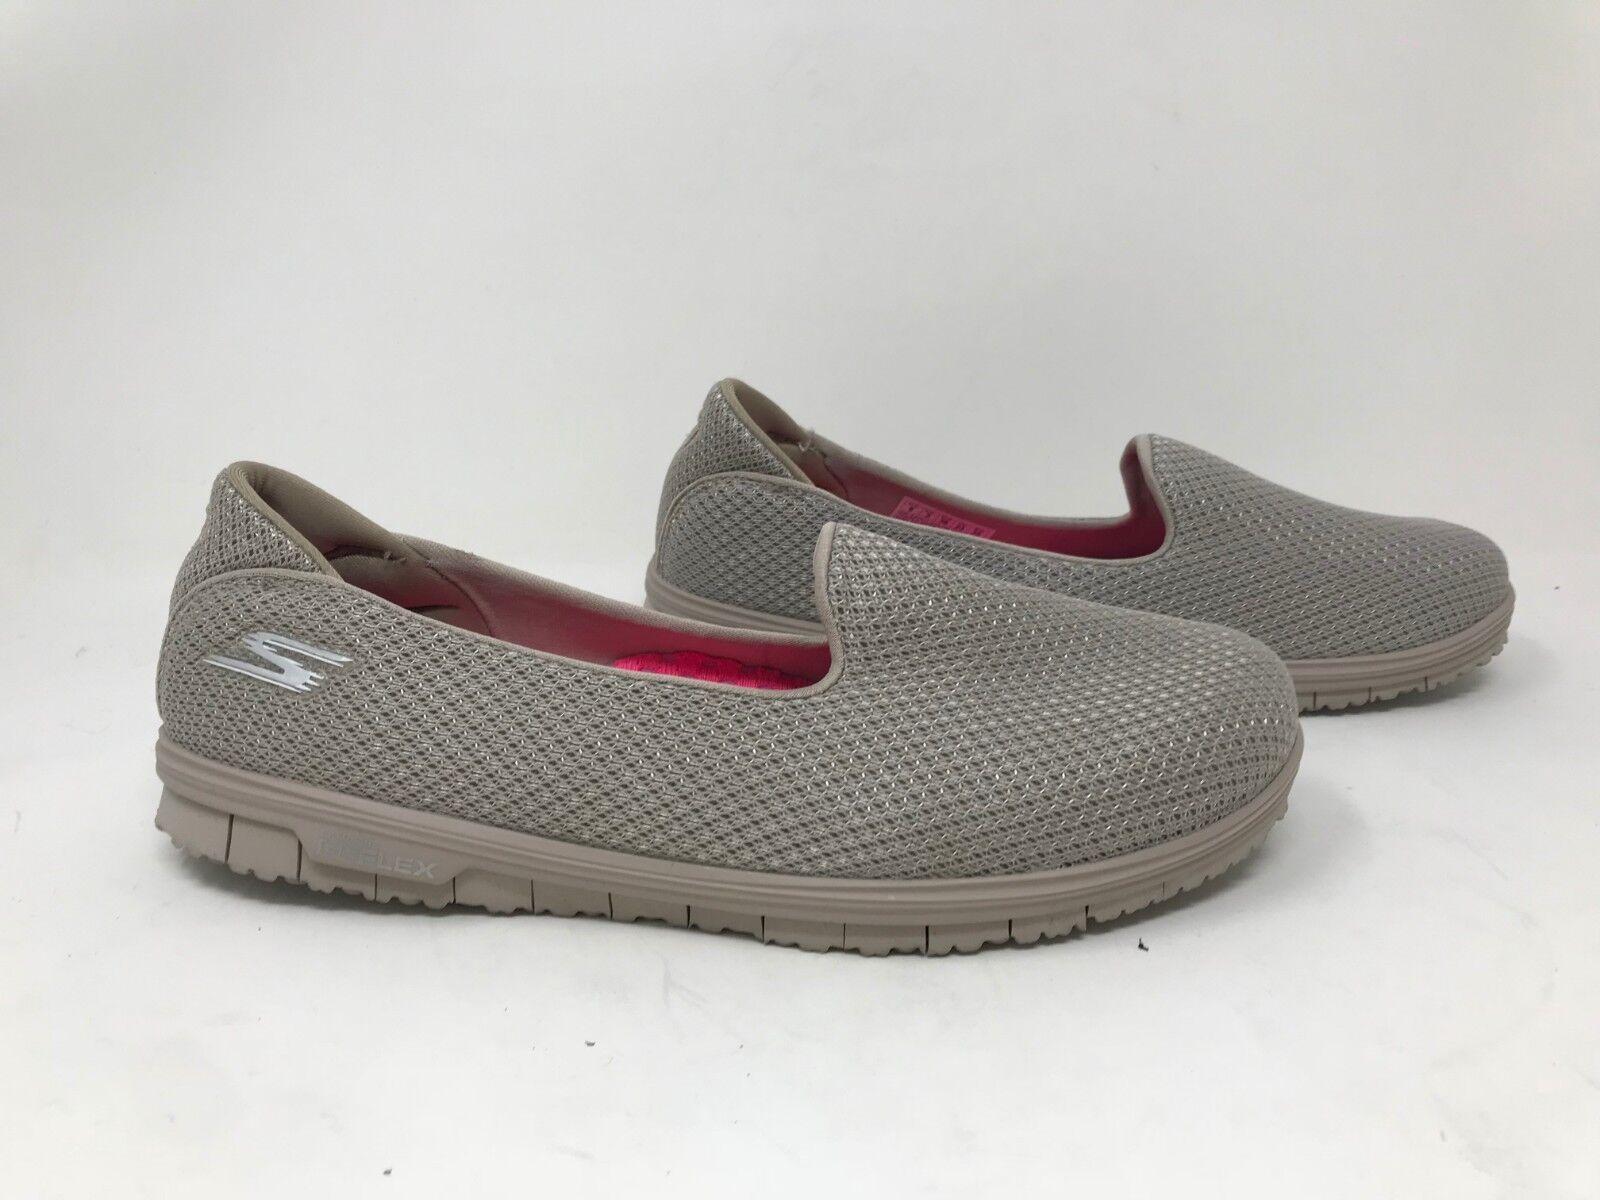 New  Womens Skechers 14007 Go Mini Flex Walk Athletic Slip-Ons- Taupe 32Z